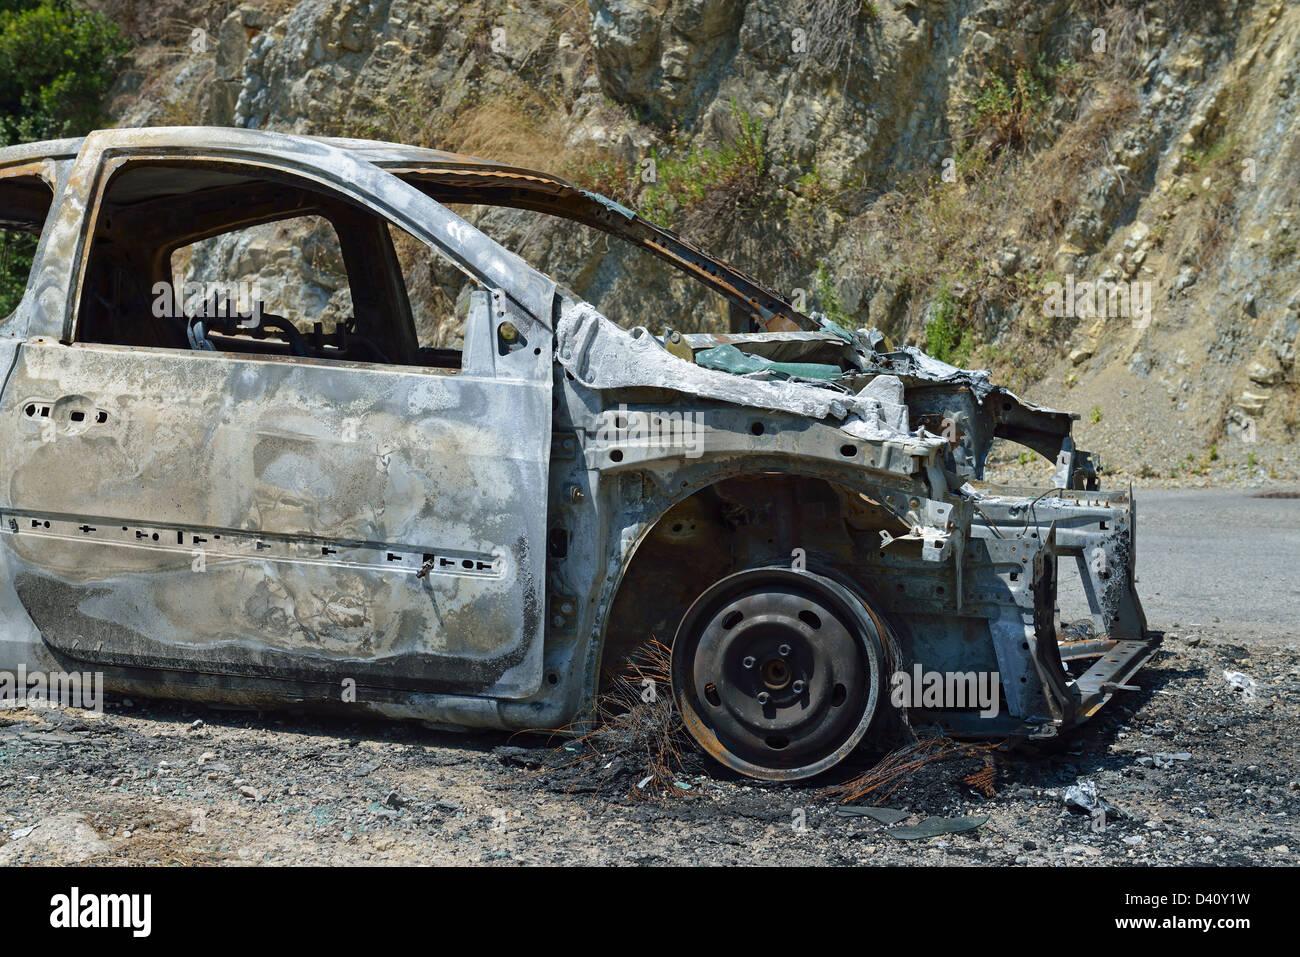 Abgebrochene ausgebrannt auto fahrzeug Wrack Stockbild